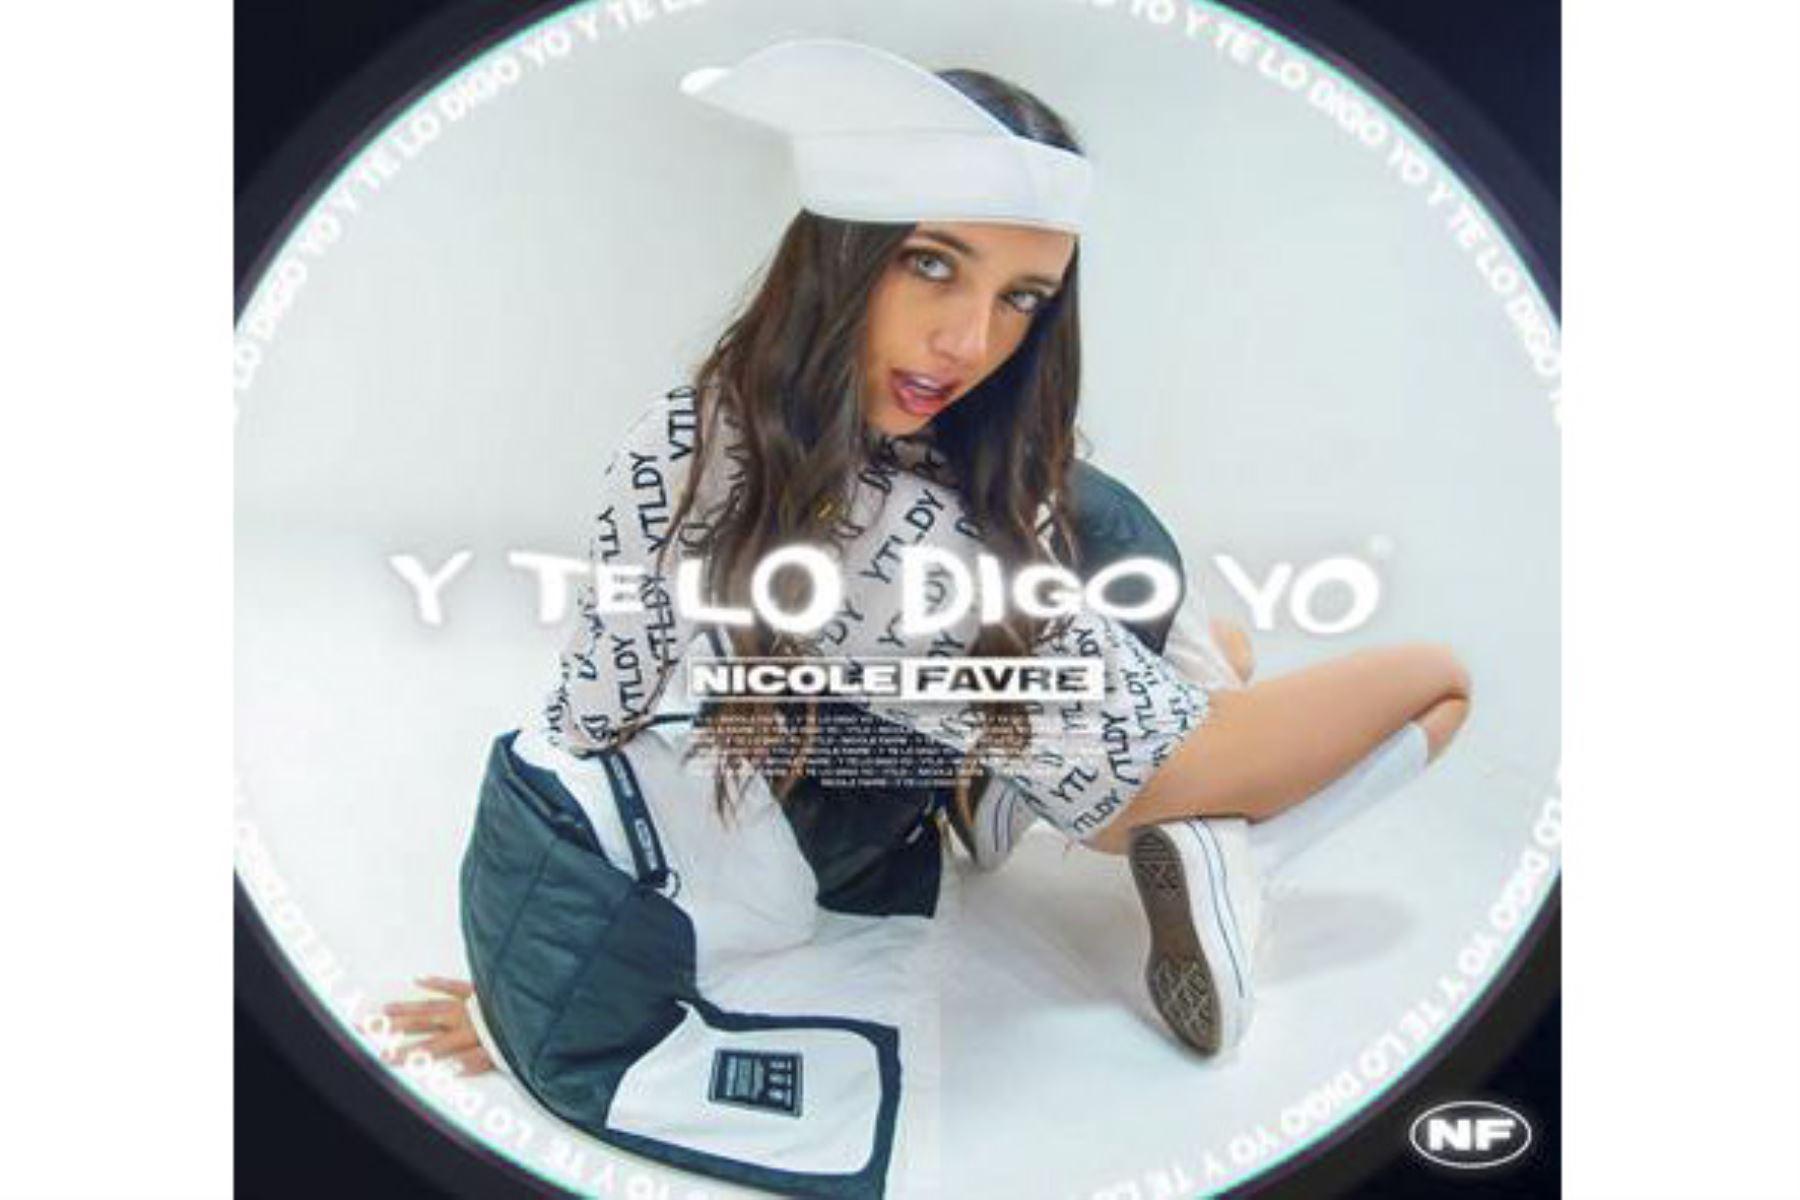 Primera peruana en ser fichada por Universal Music México Nicole Favre presenta disco